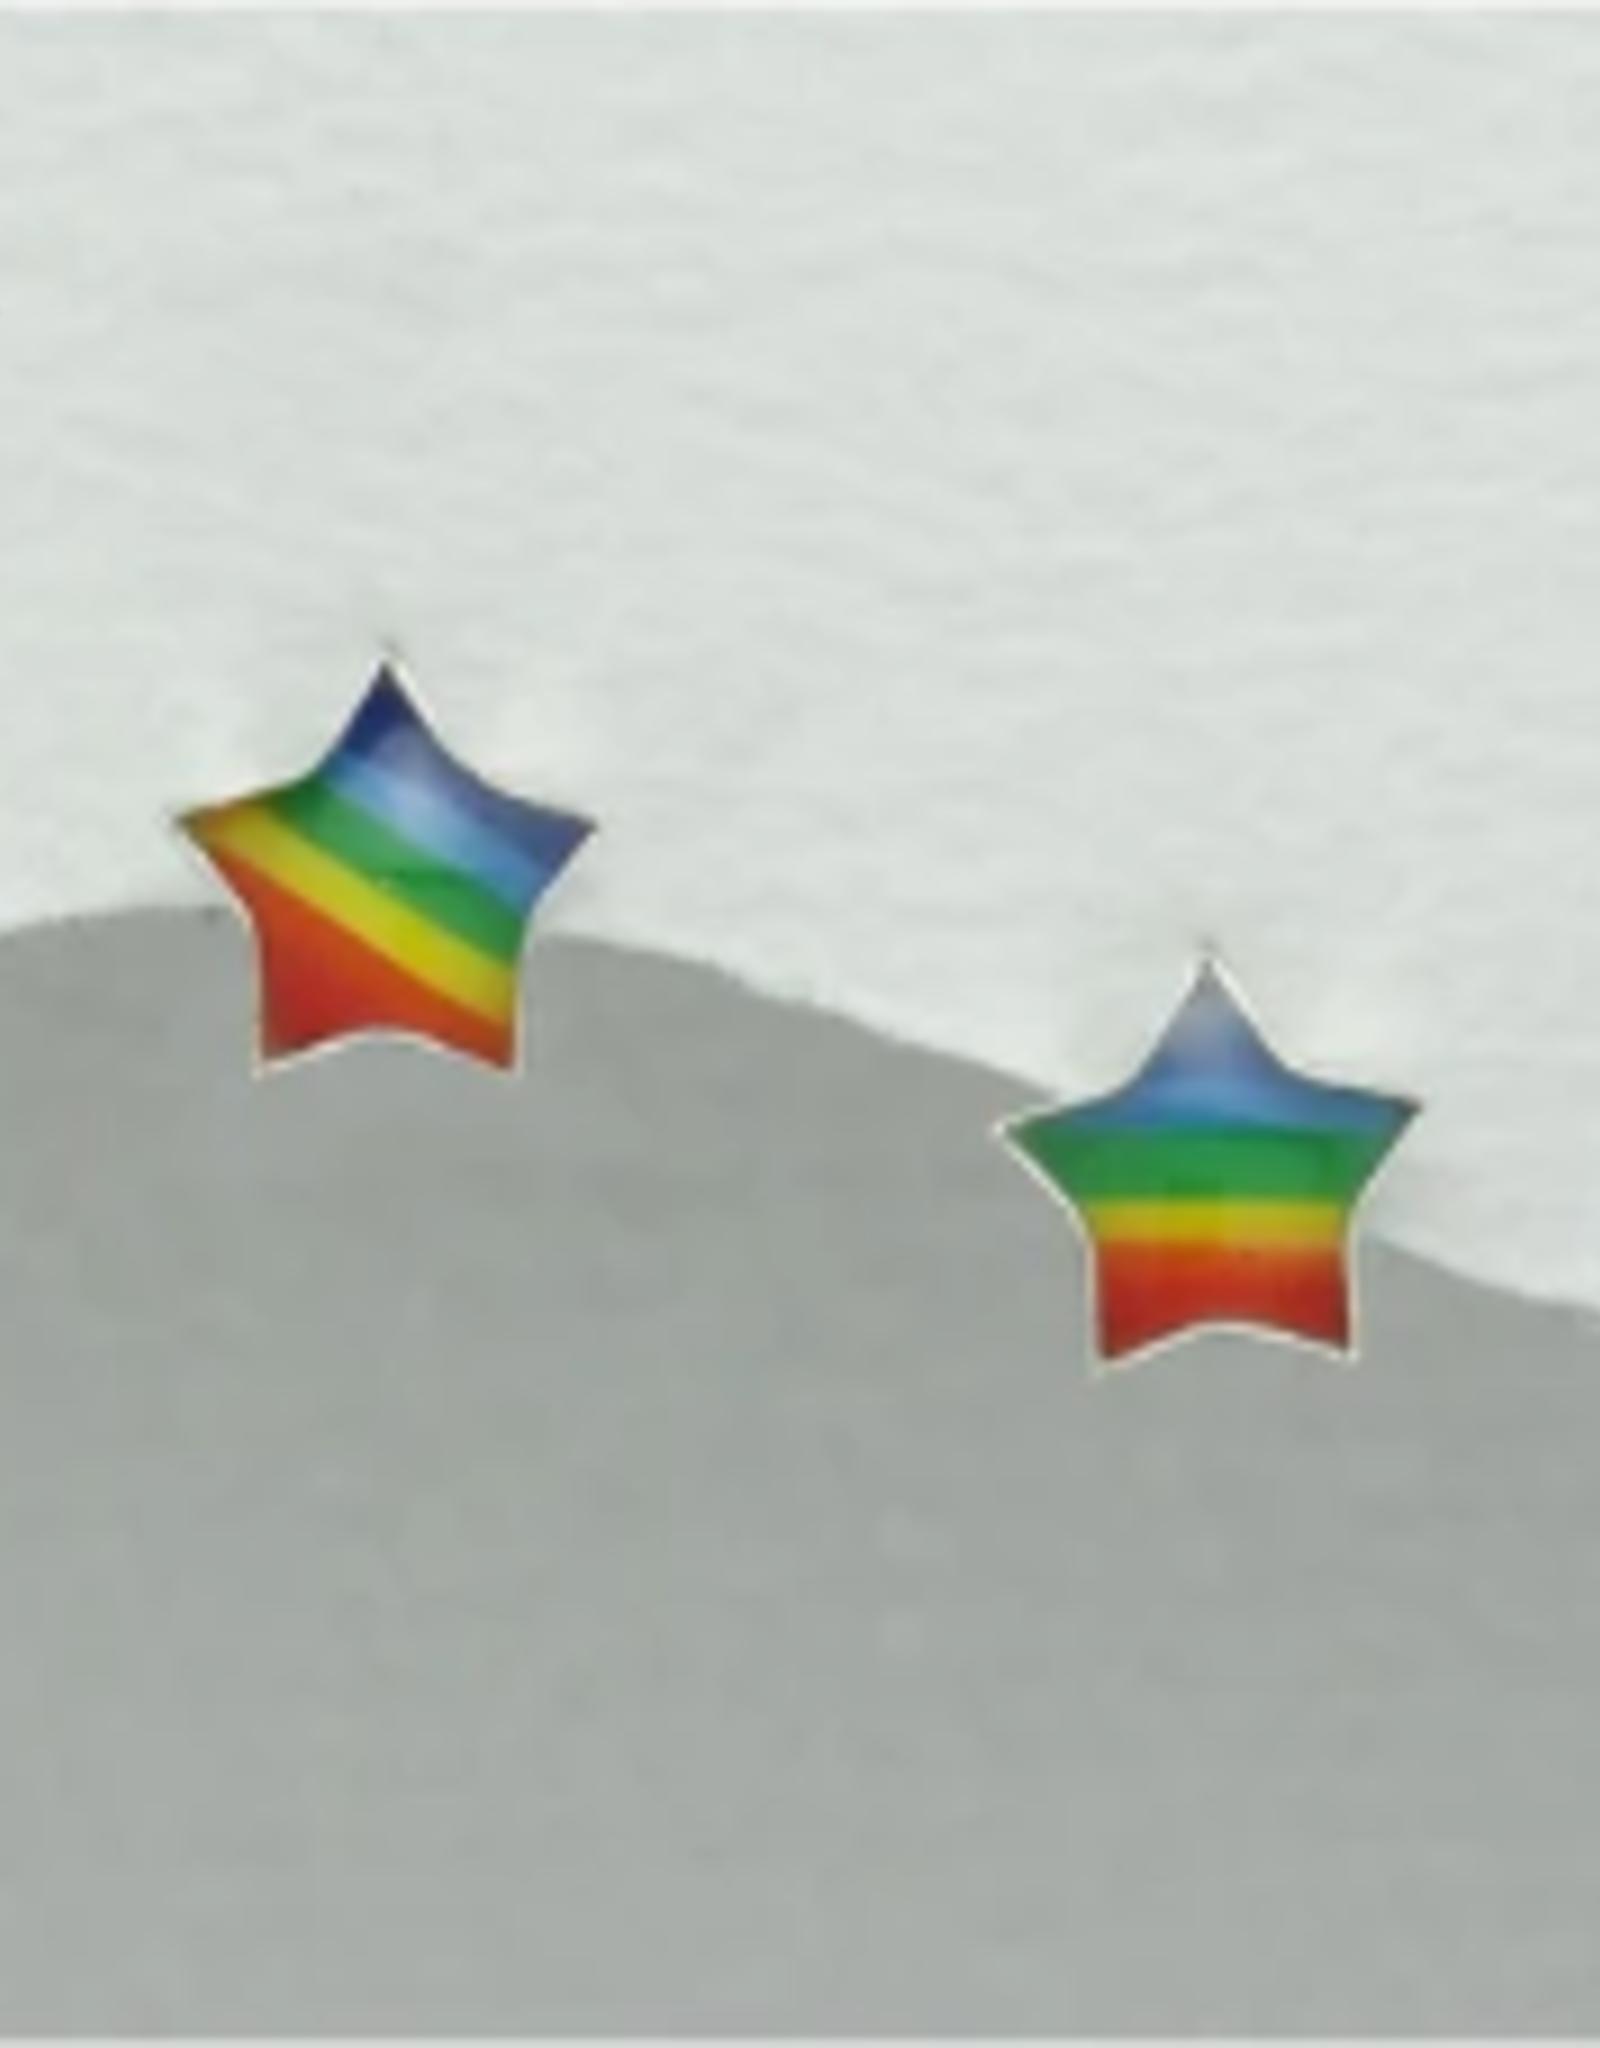 Lily & Momo Shooting Star Earrings, rainbow